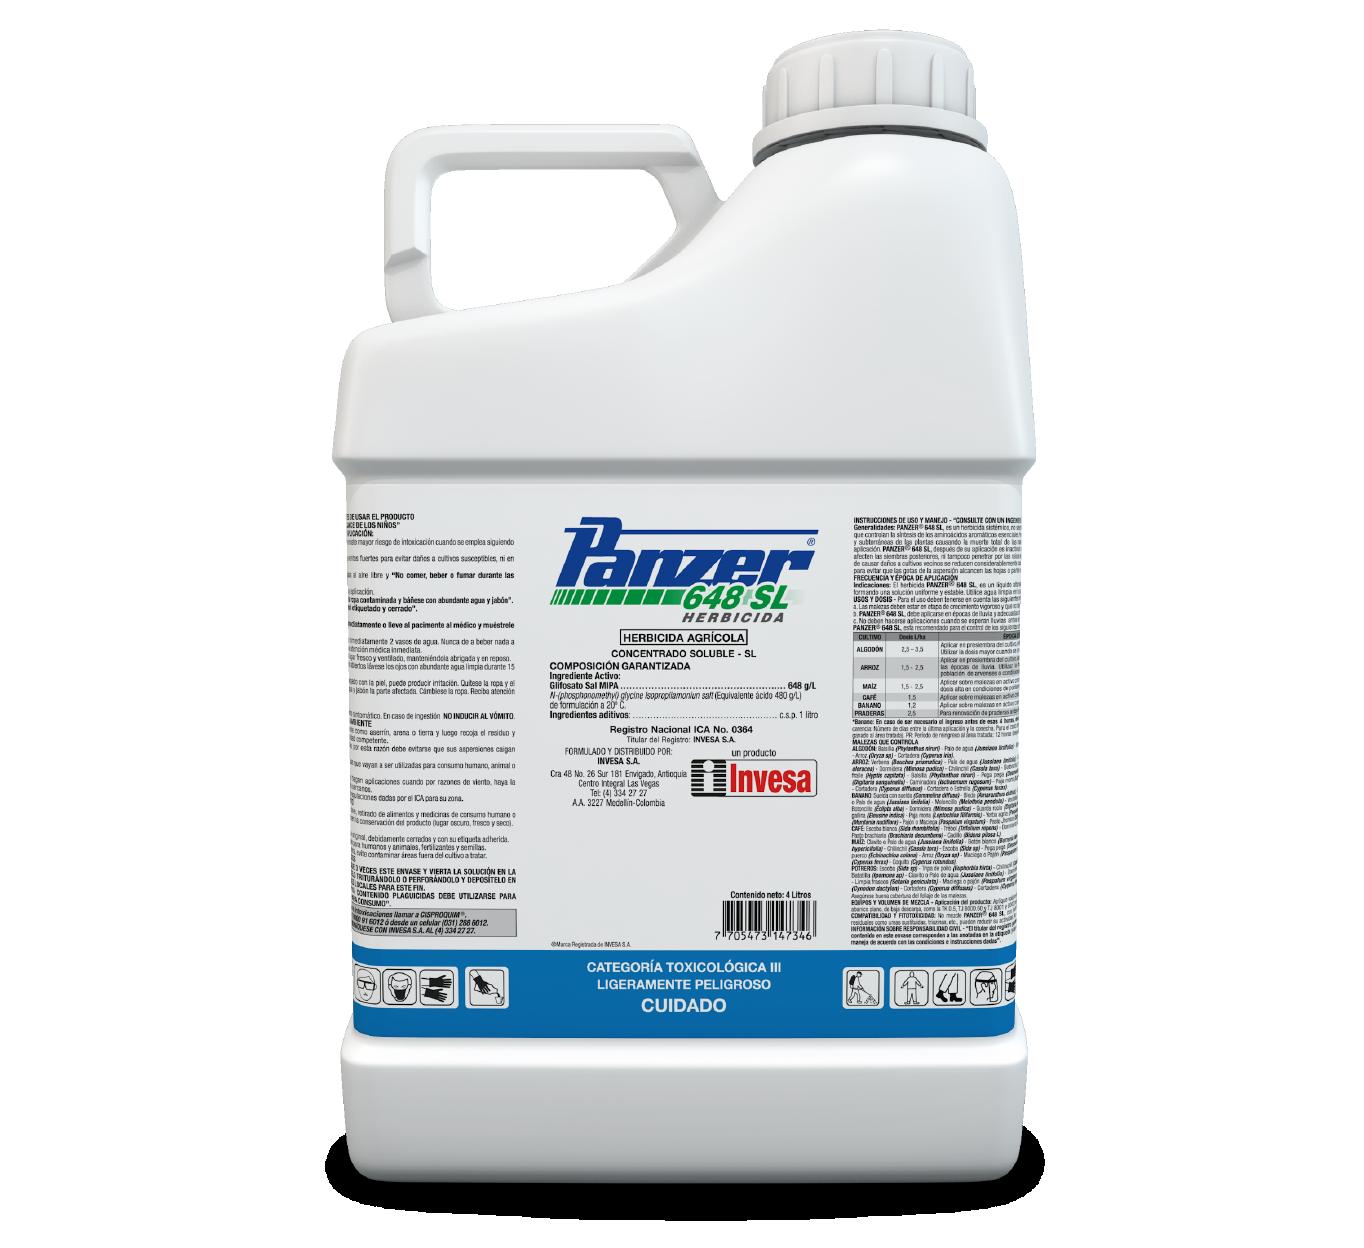 Herbicida panzer 648 invesa 4 litros